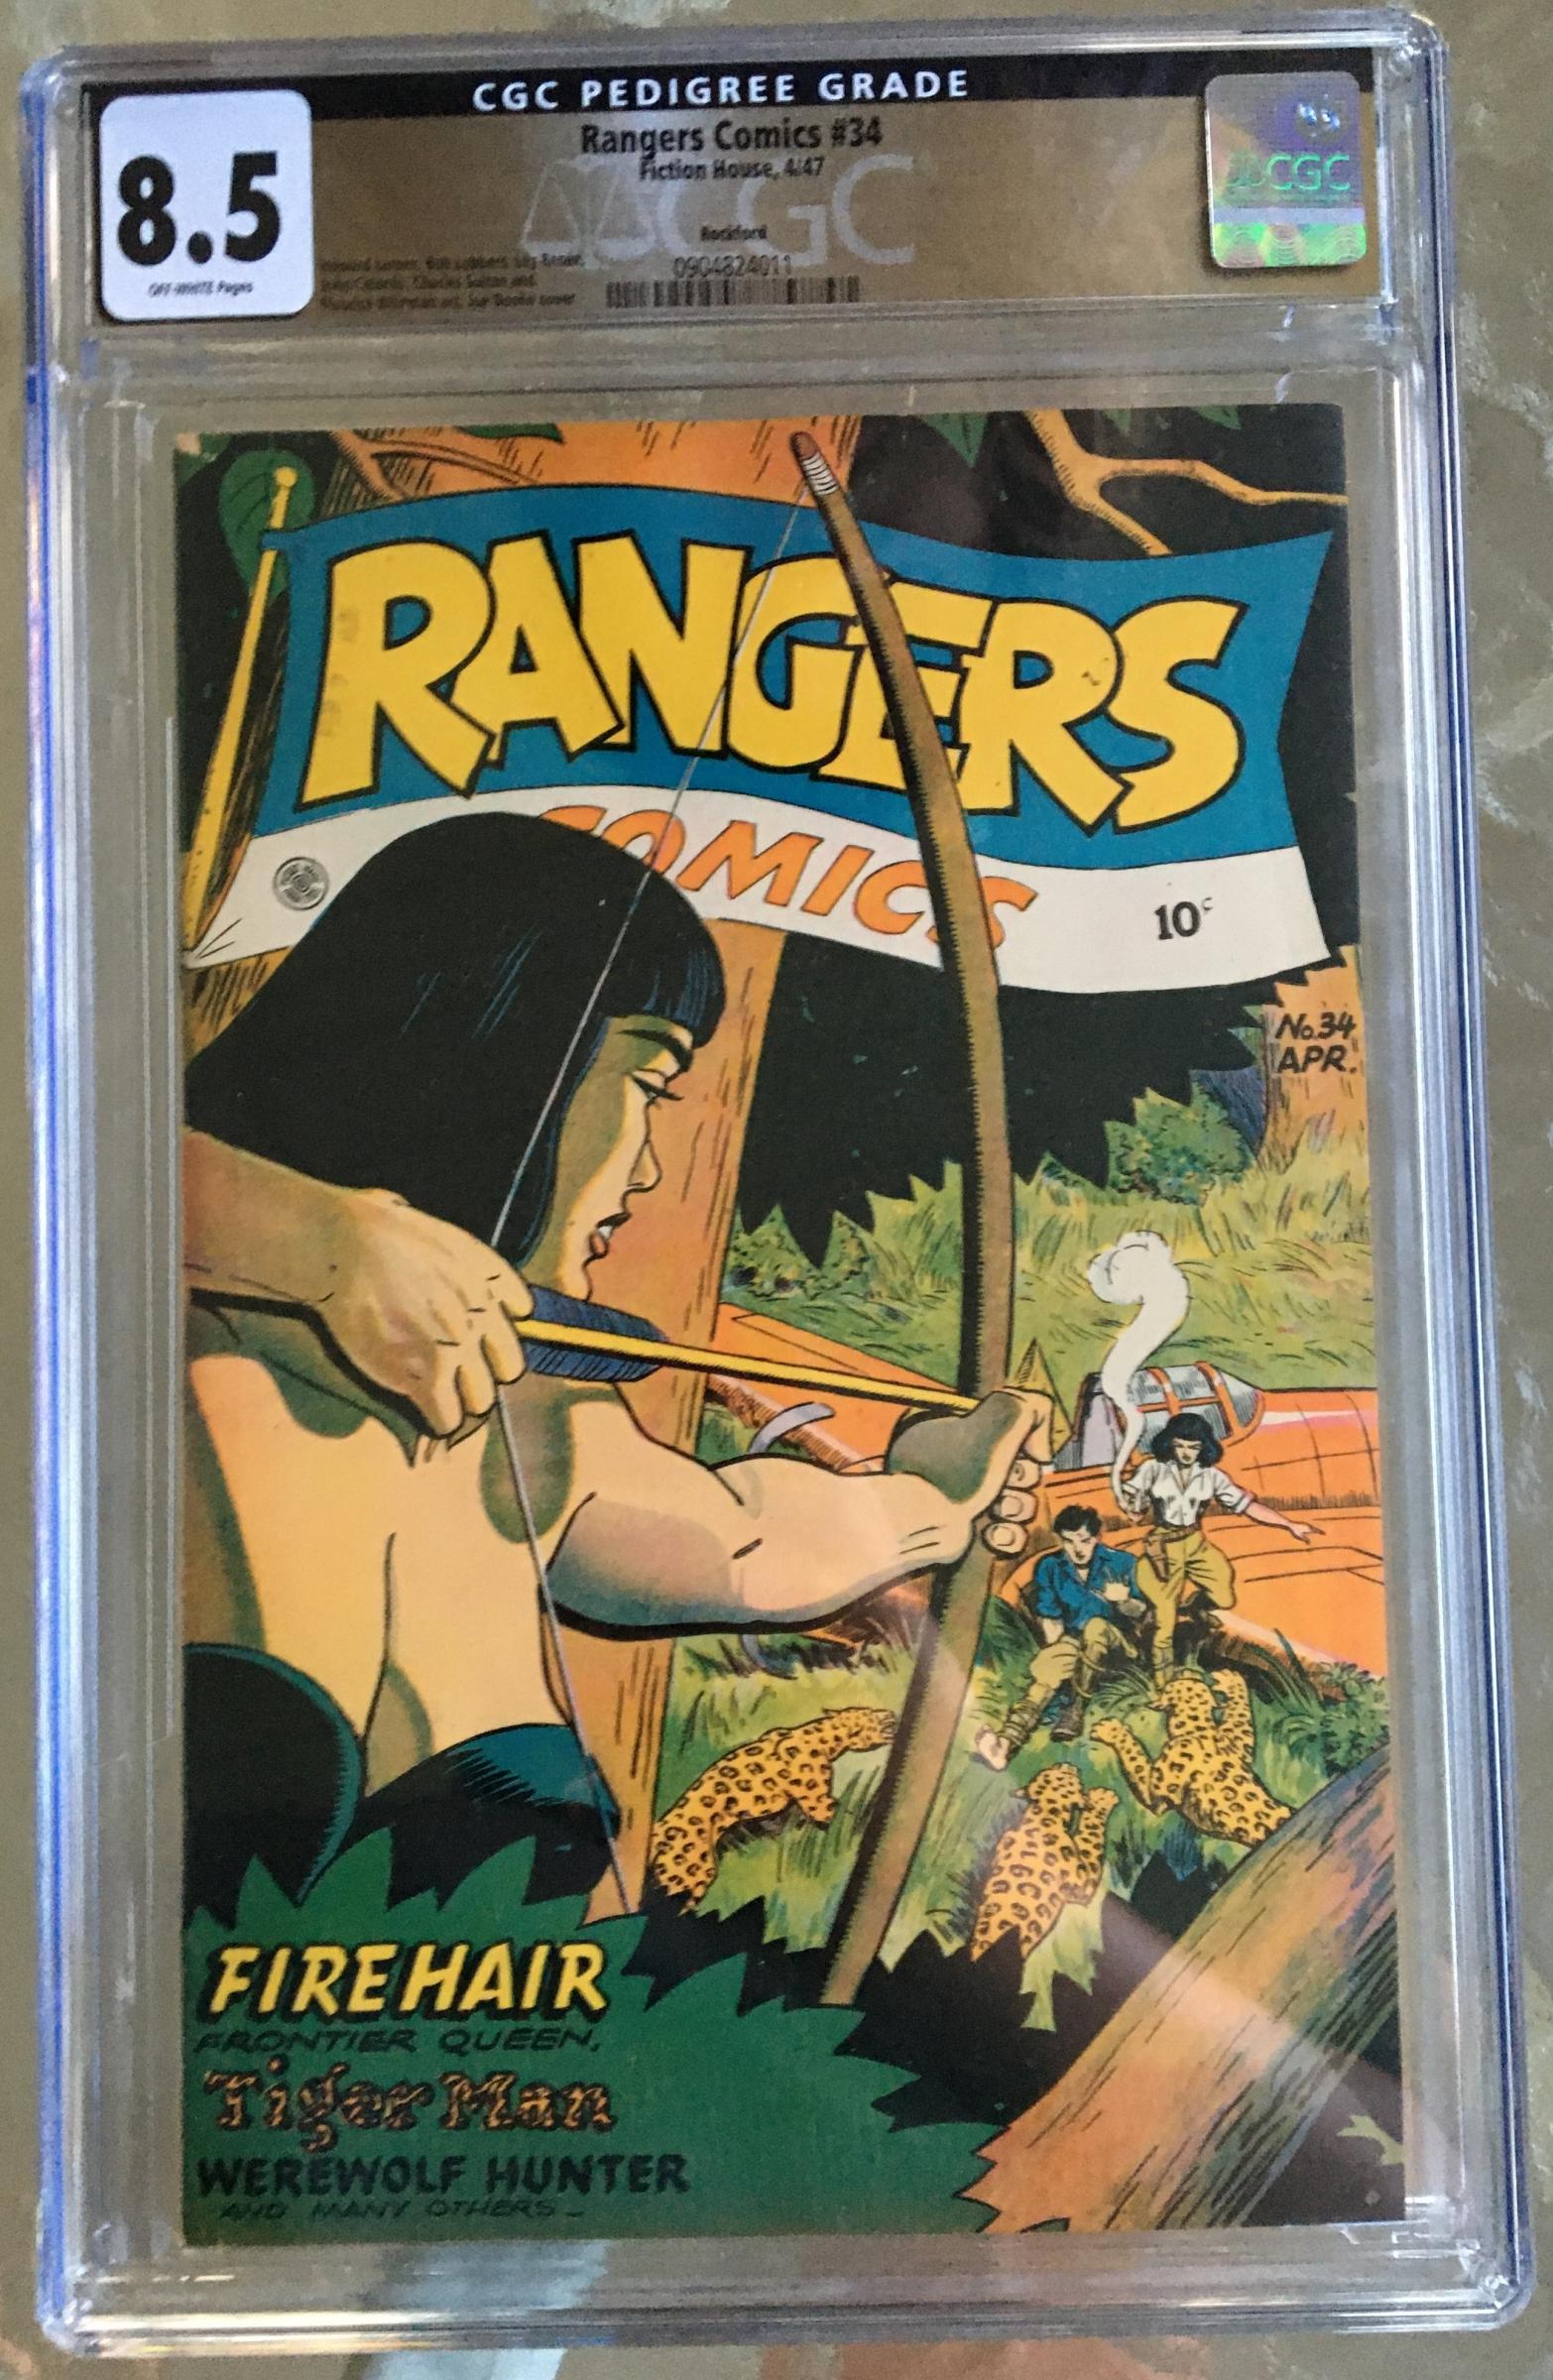 Rangers Comics #34 CGC 8.5 ow Rockford